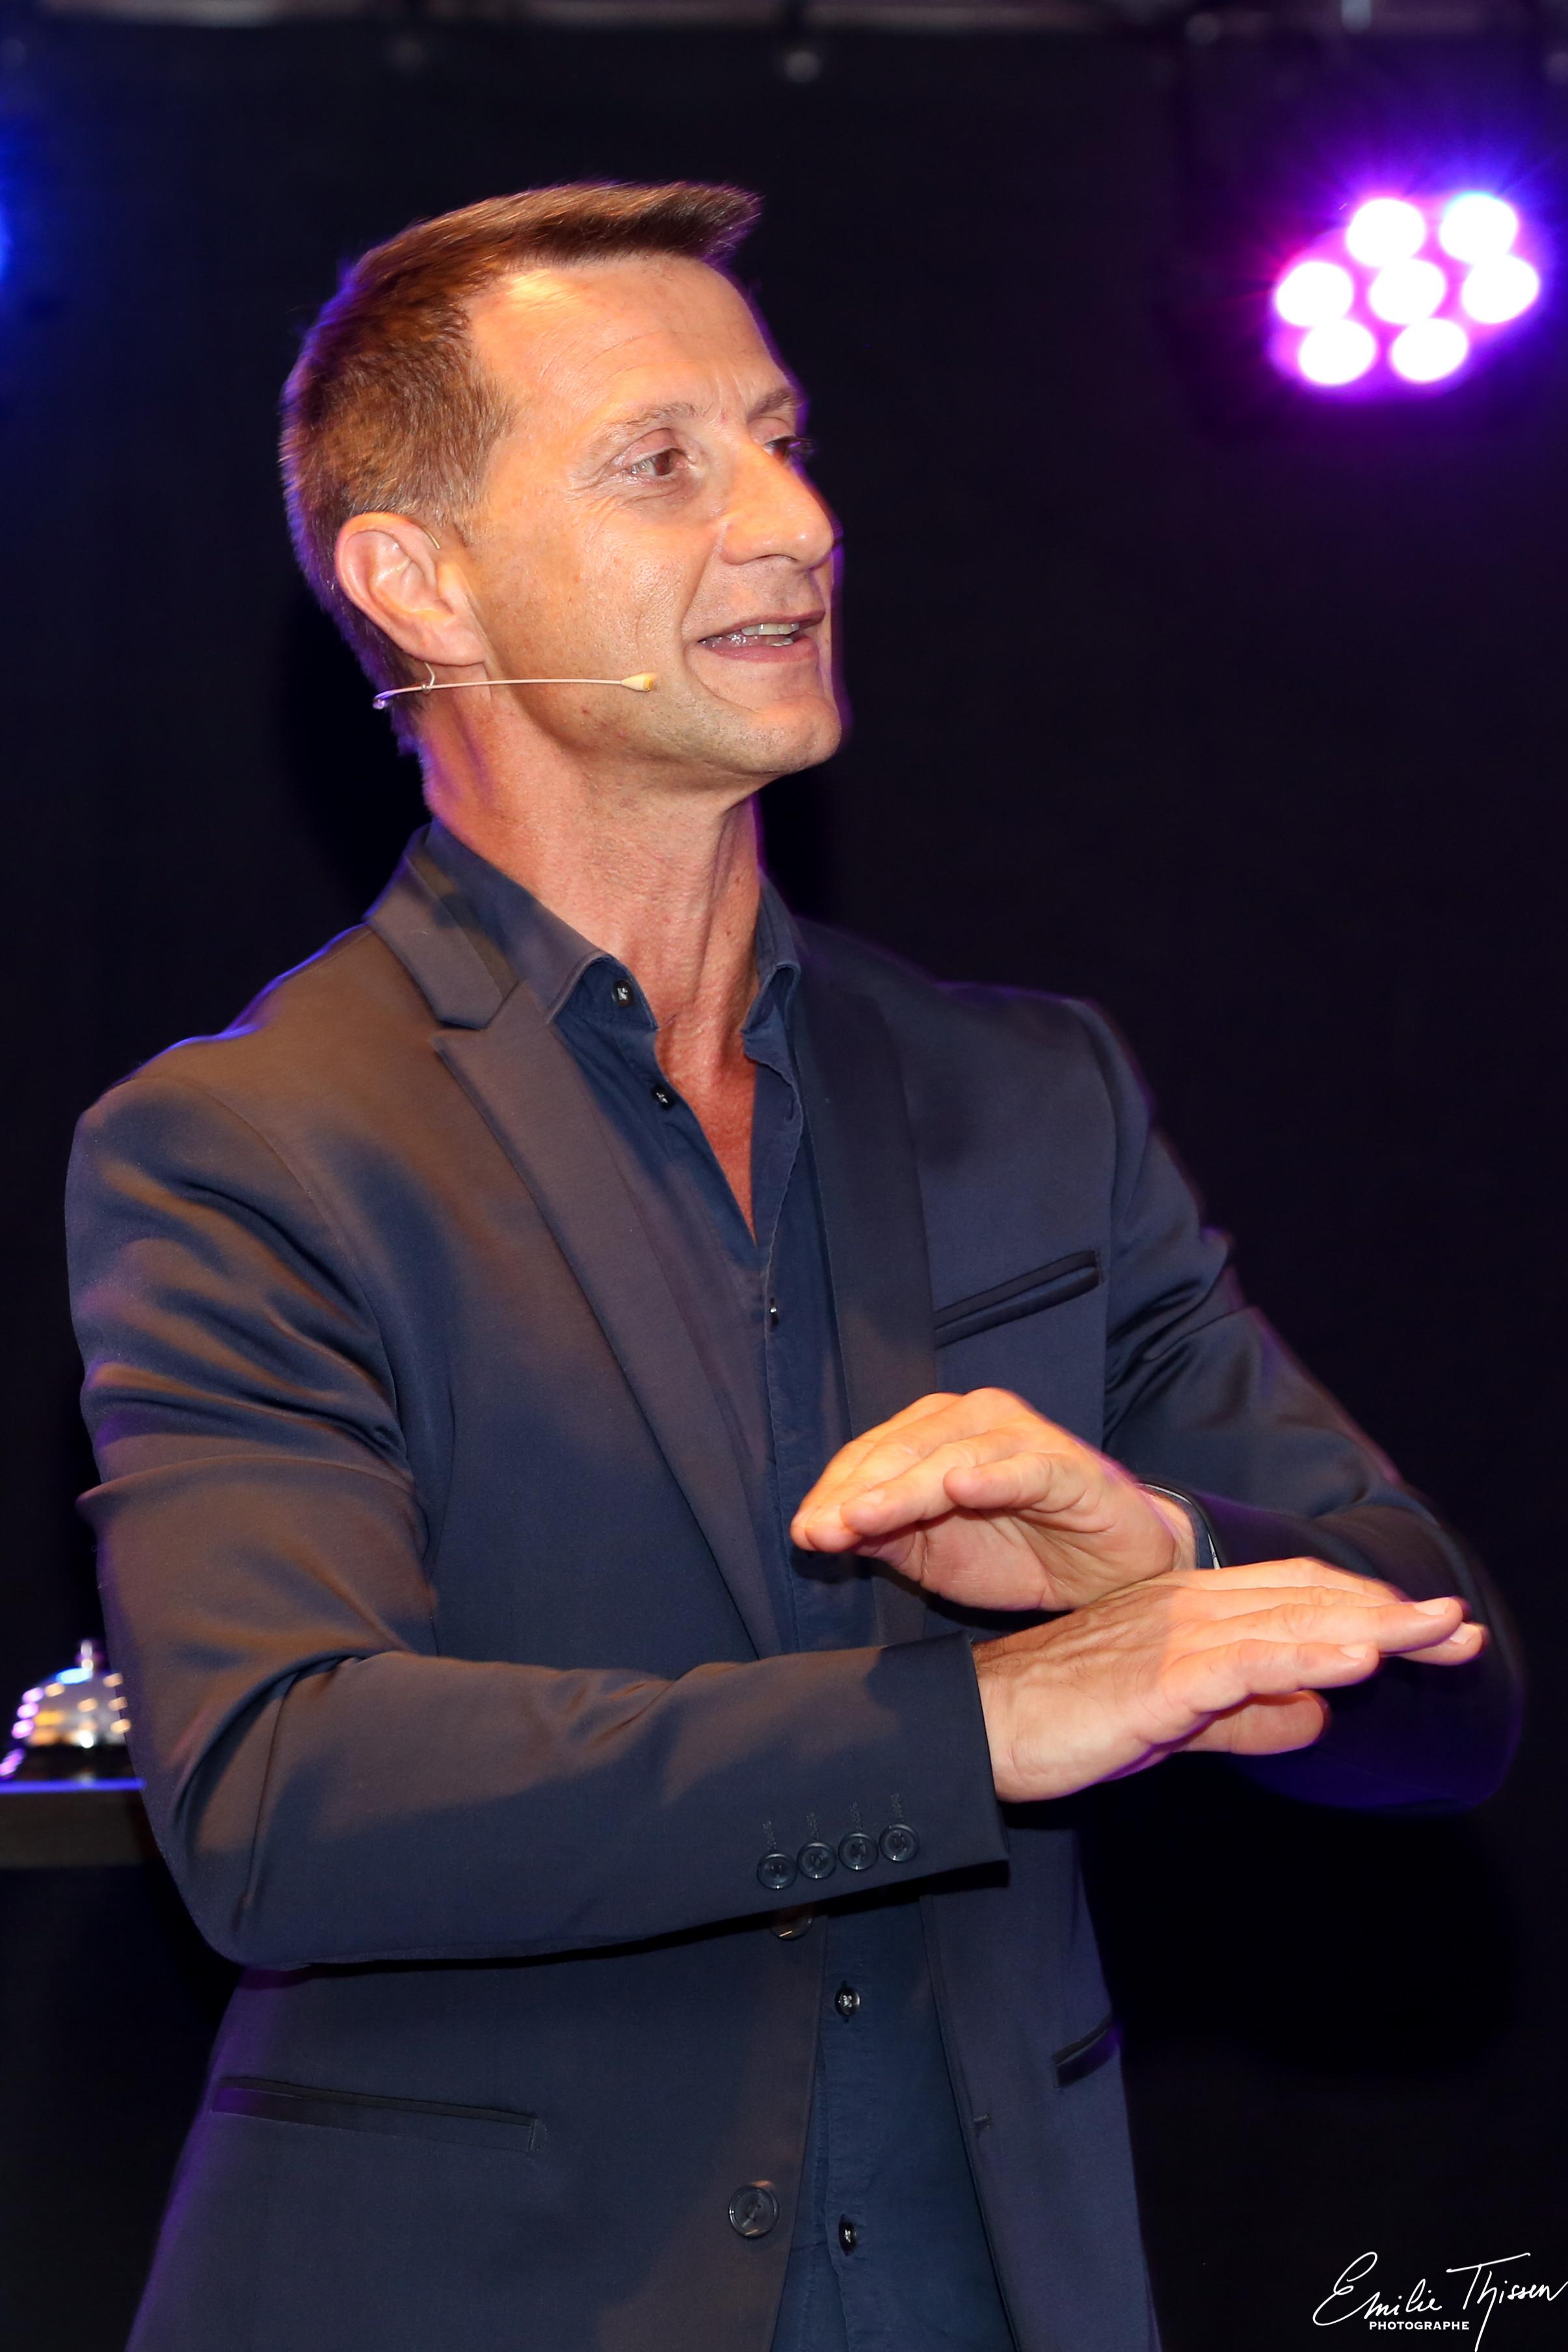 Marc Andreini